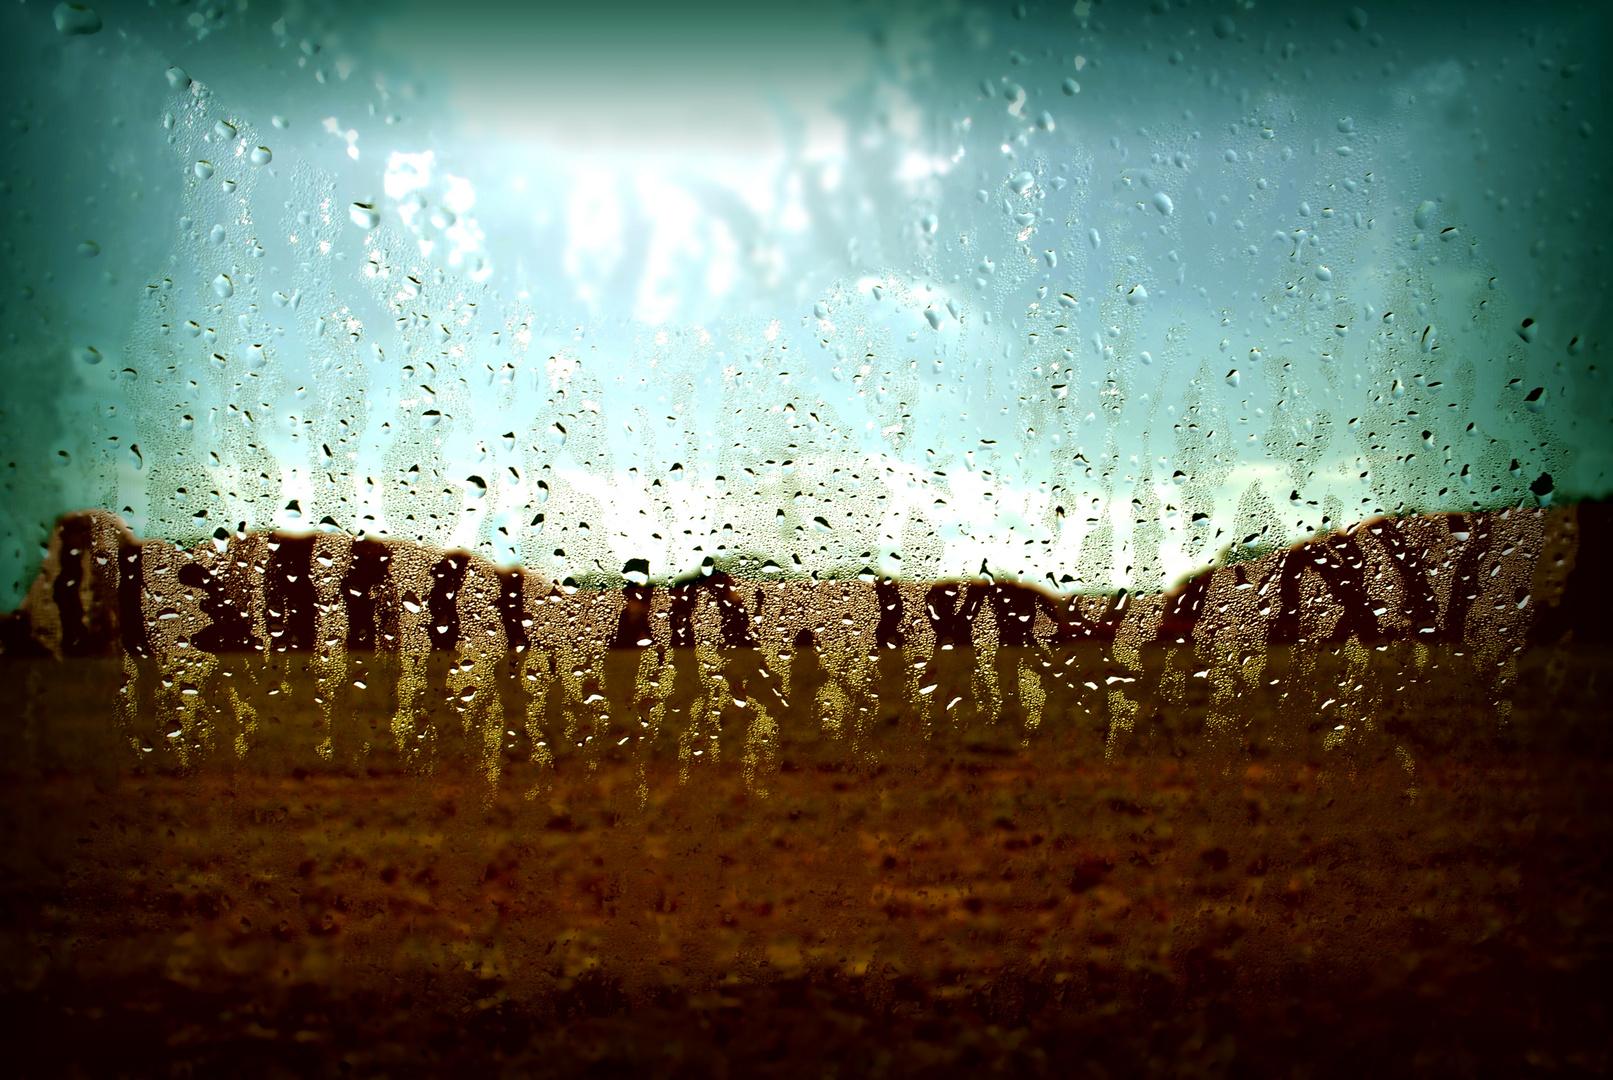 ?dancing crowd in the rain - !just drops